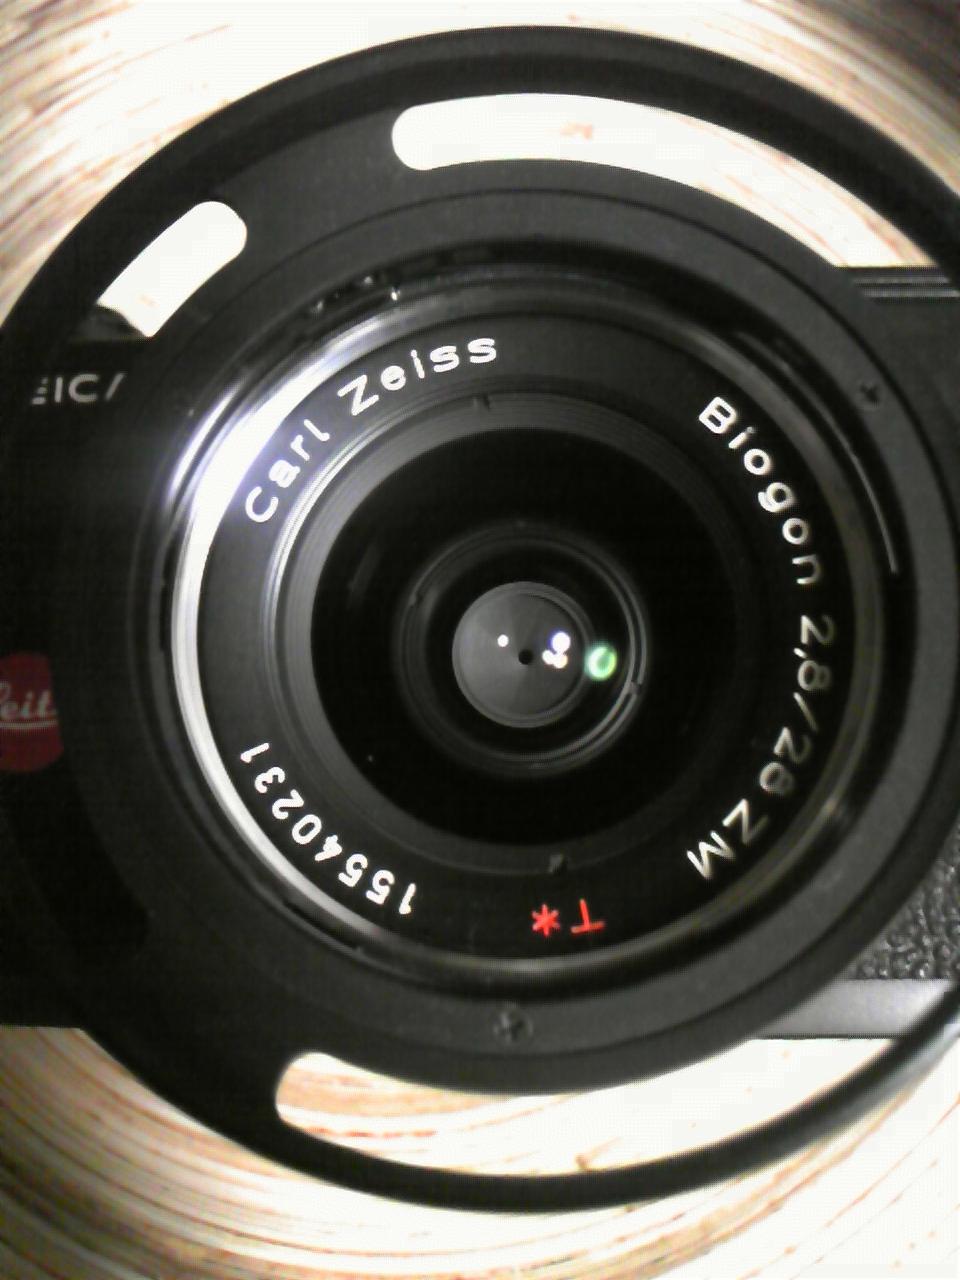 CARL ZEISS BIOGON 28mm F:2.8 on LEICA M4-P